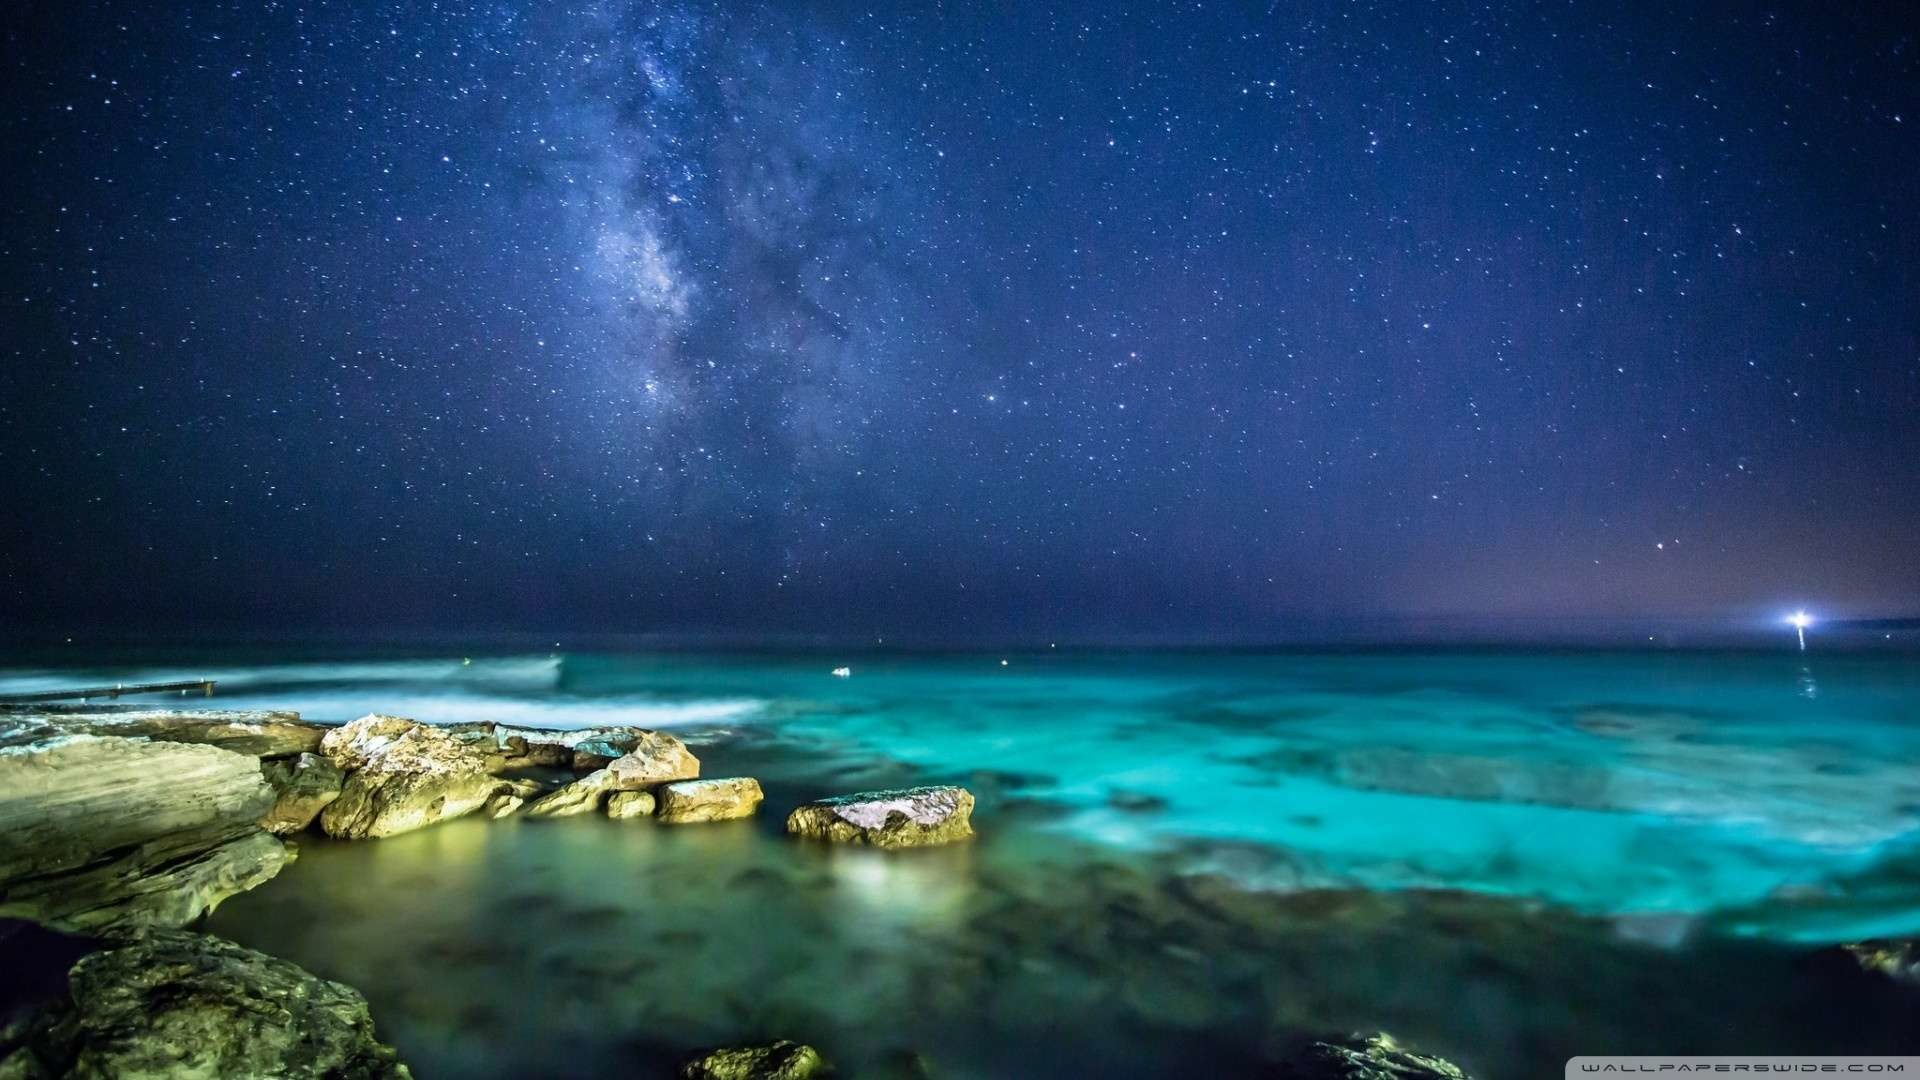 Wallpaper: Ocean Night Sky Wallpaper 1080p HD. Upload at February 16 .